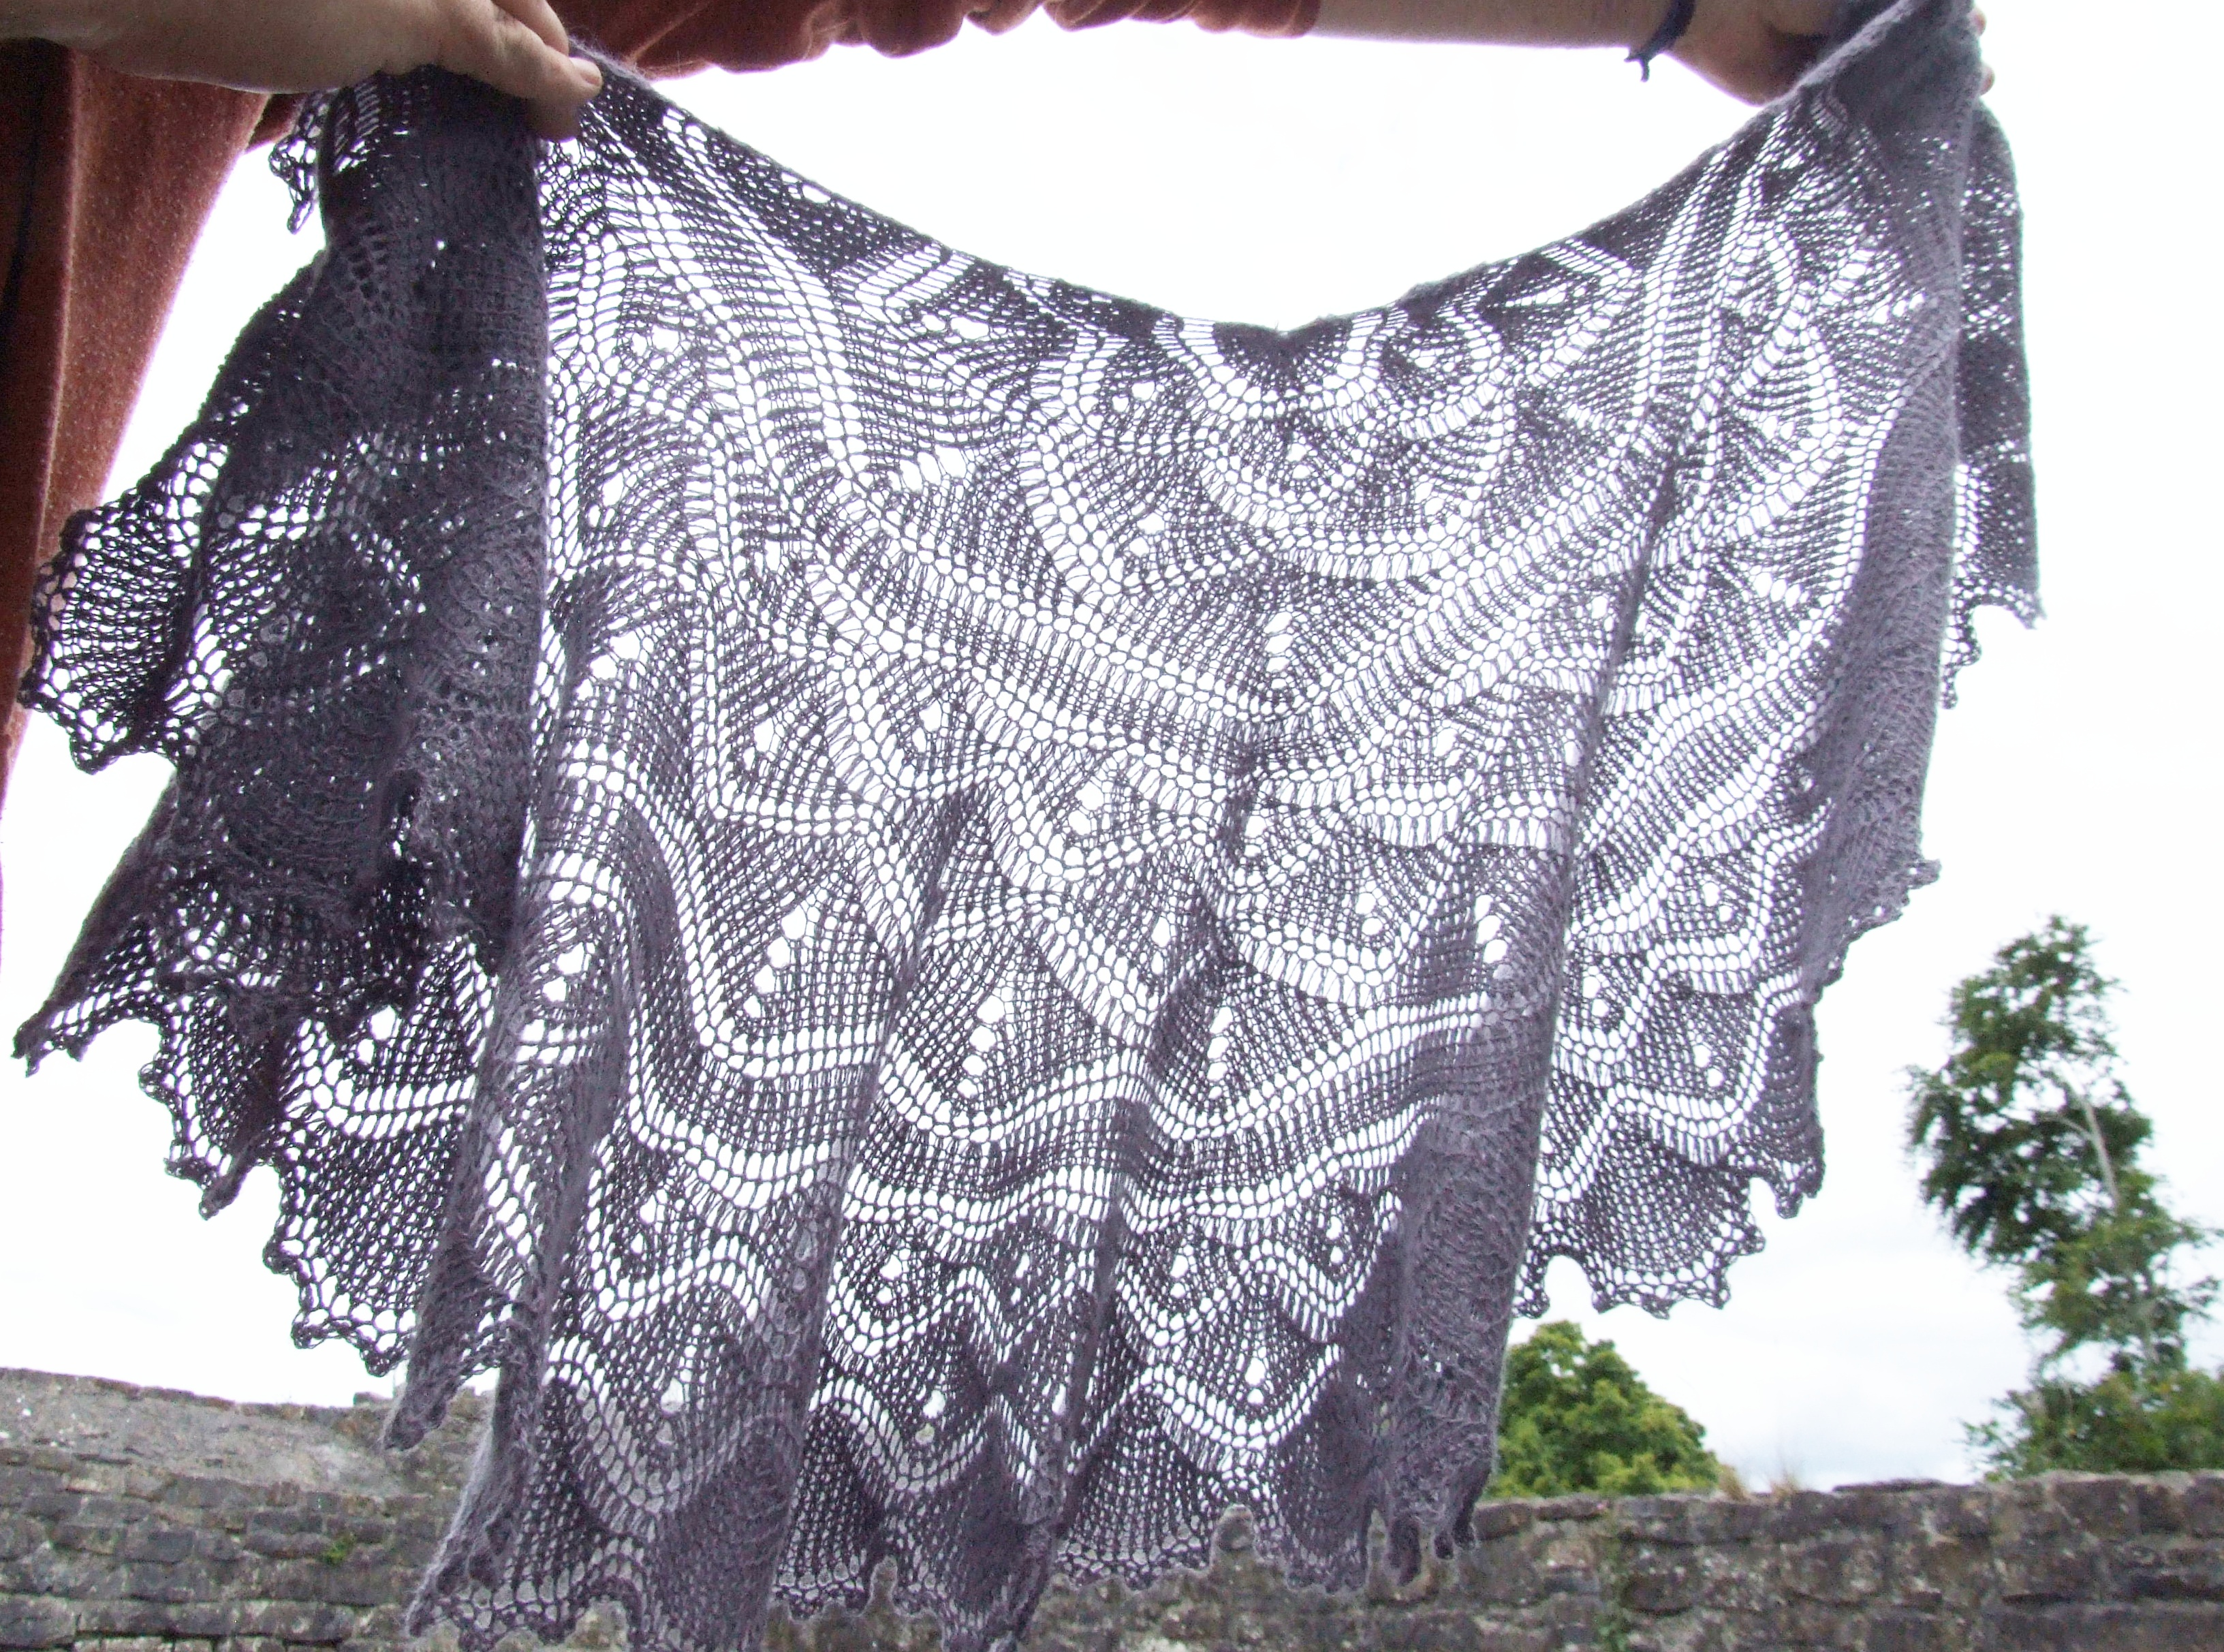 sun shines through a violet tunisian crochet shawl